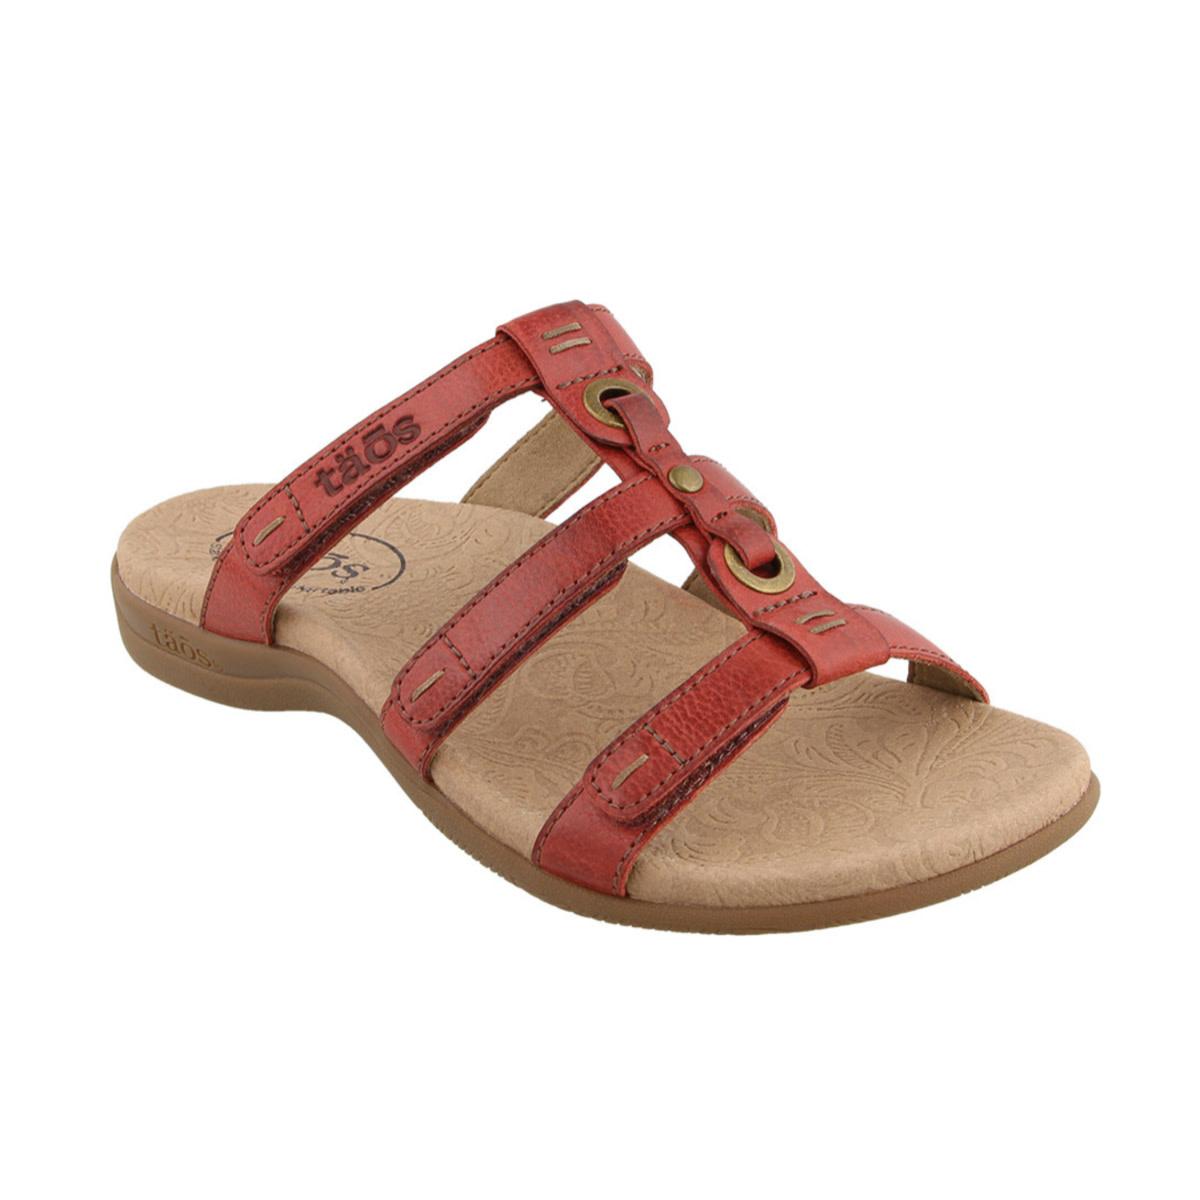 Taos Footwear Taos Nifty Red